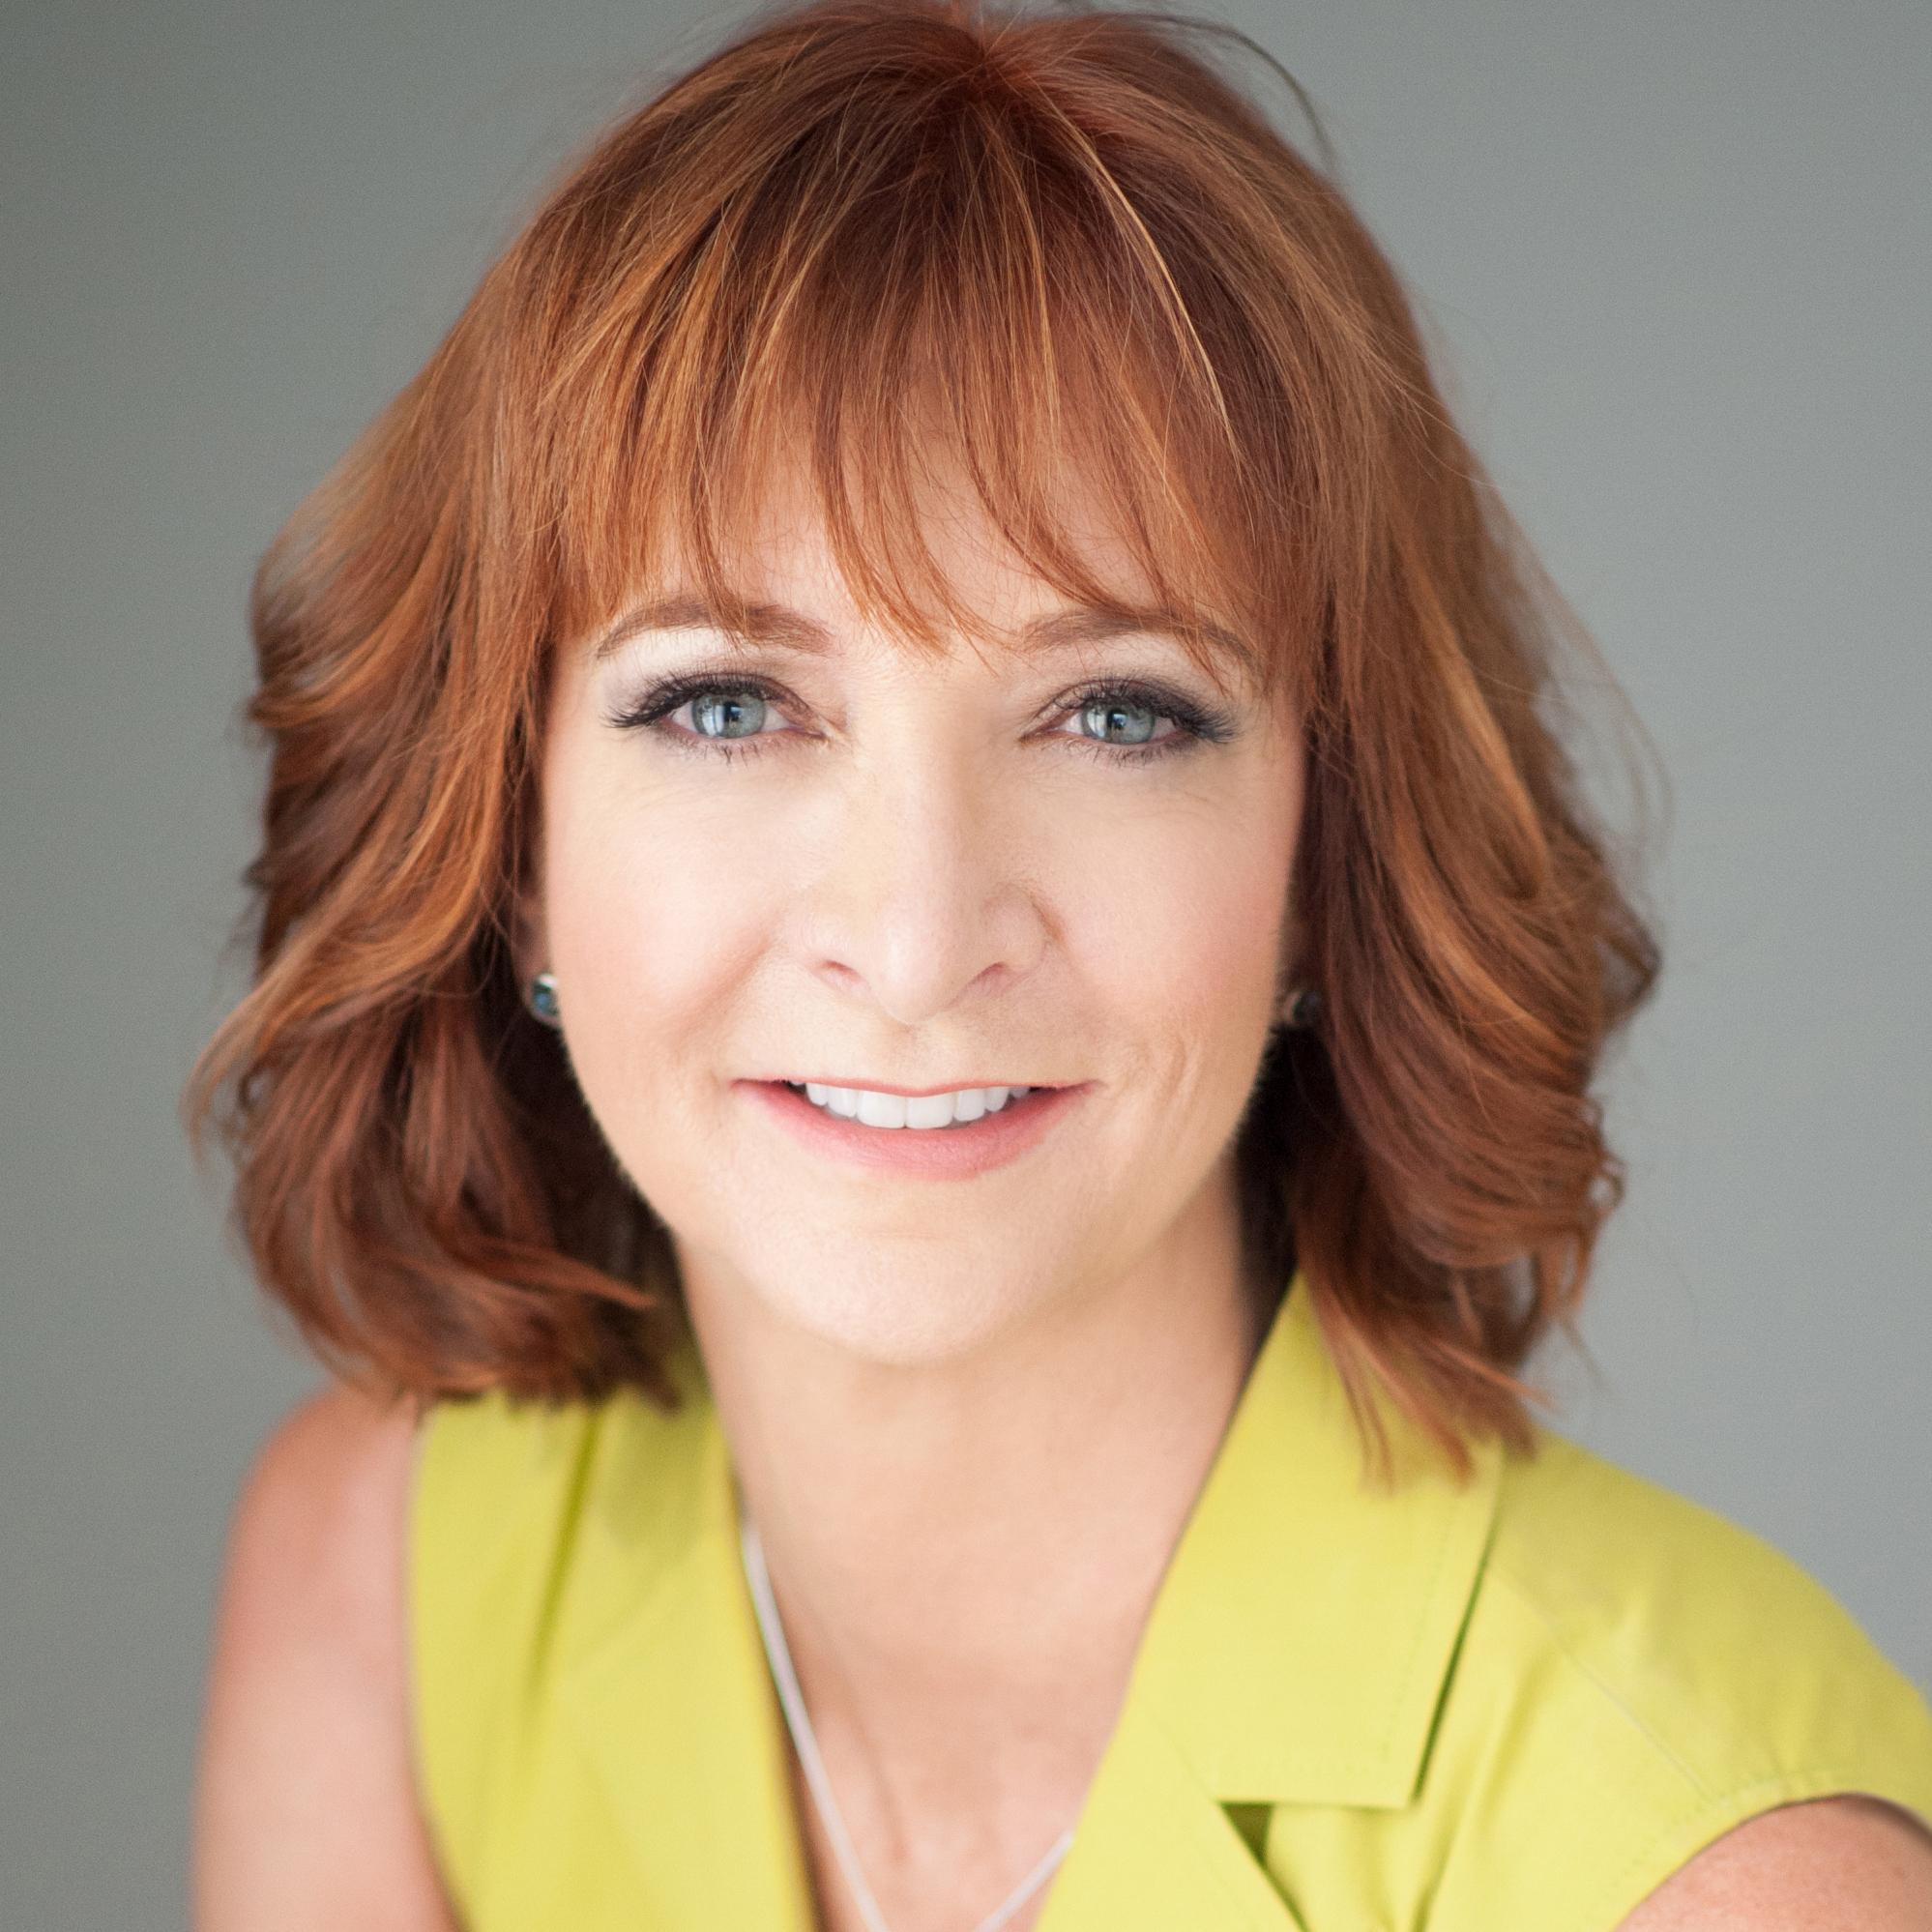 Lynn Charlas White - CNS, CHMS, PSA